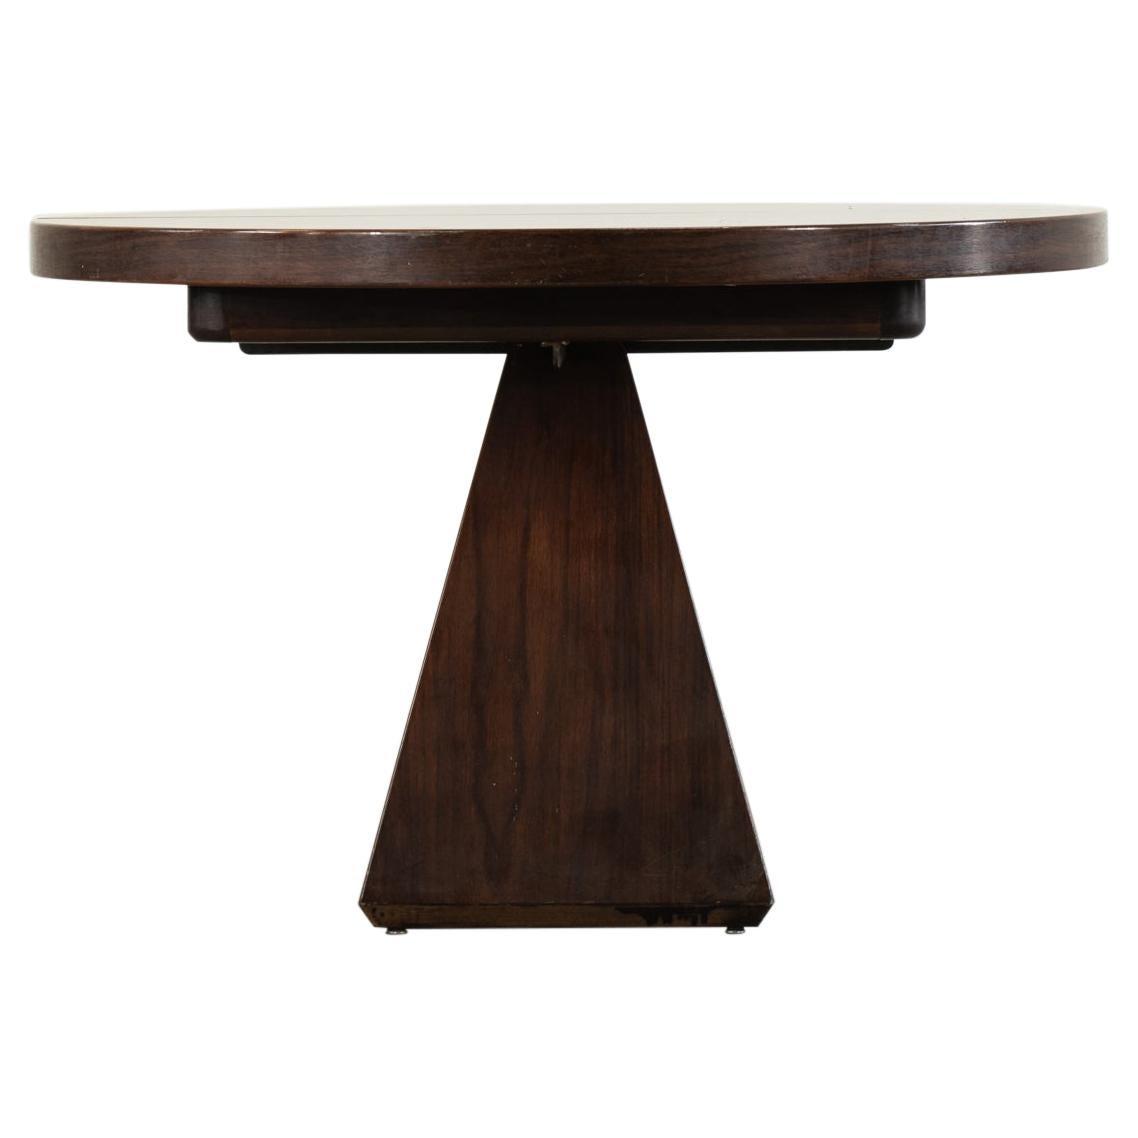 Vittorio Introini Round Dining Table Chelsea for Saporiti, 1960s